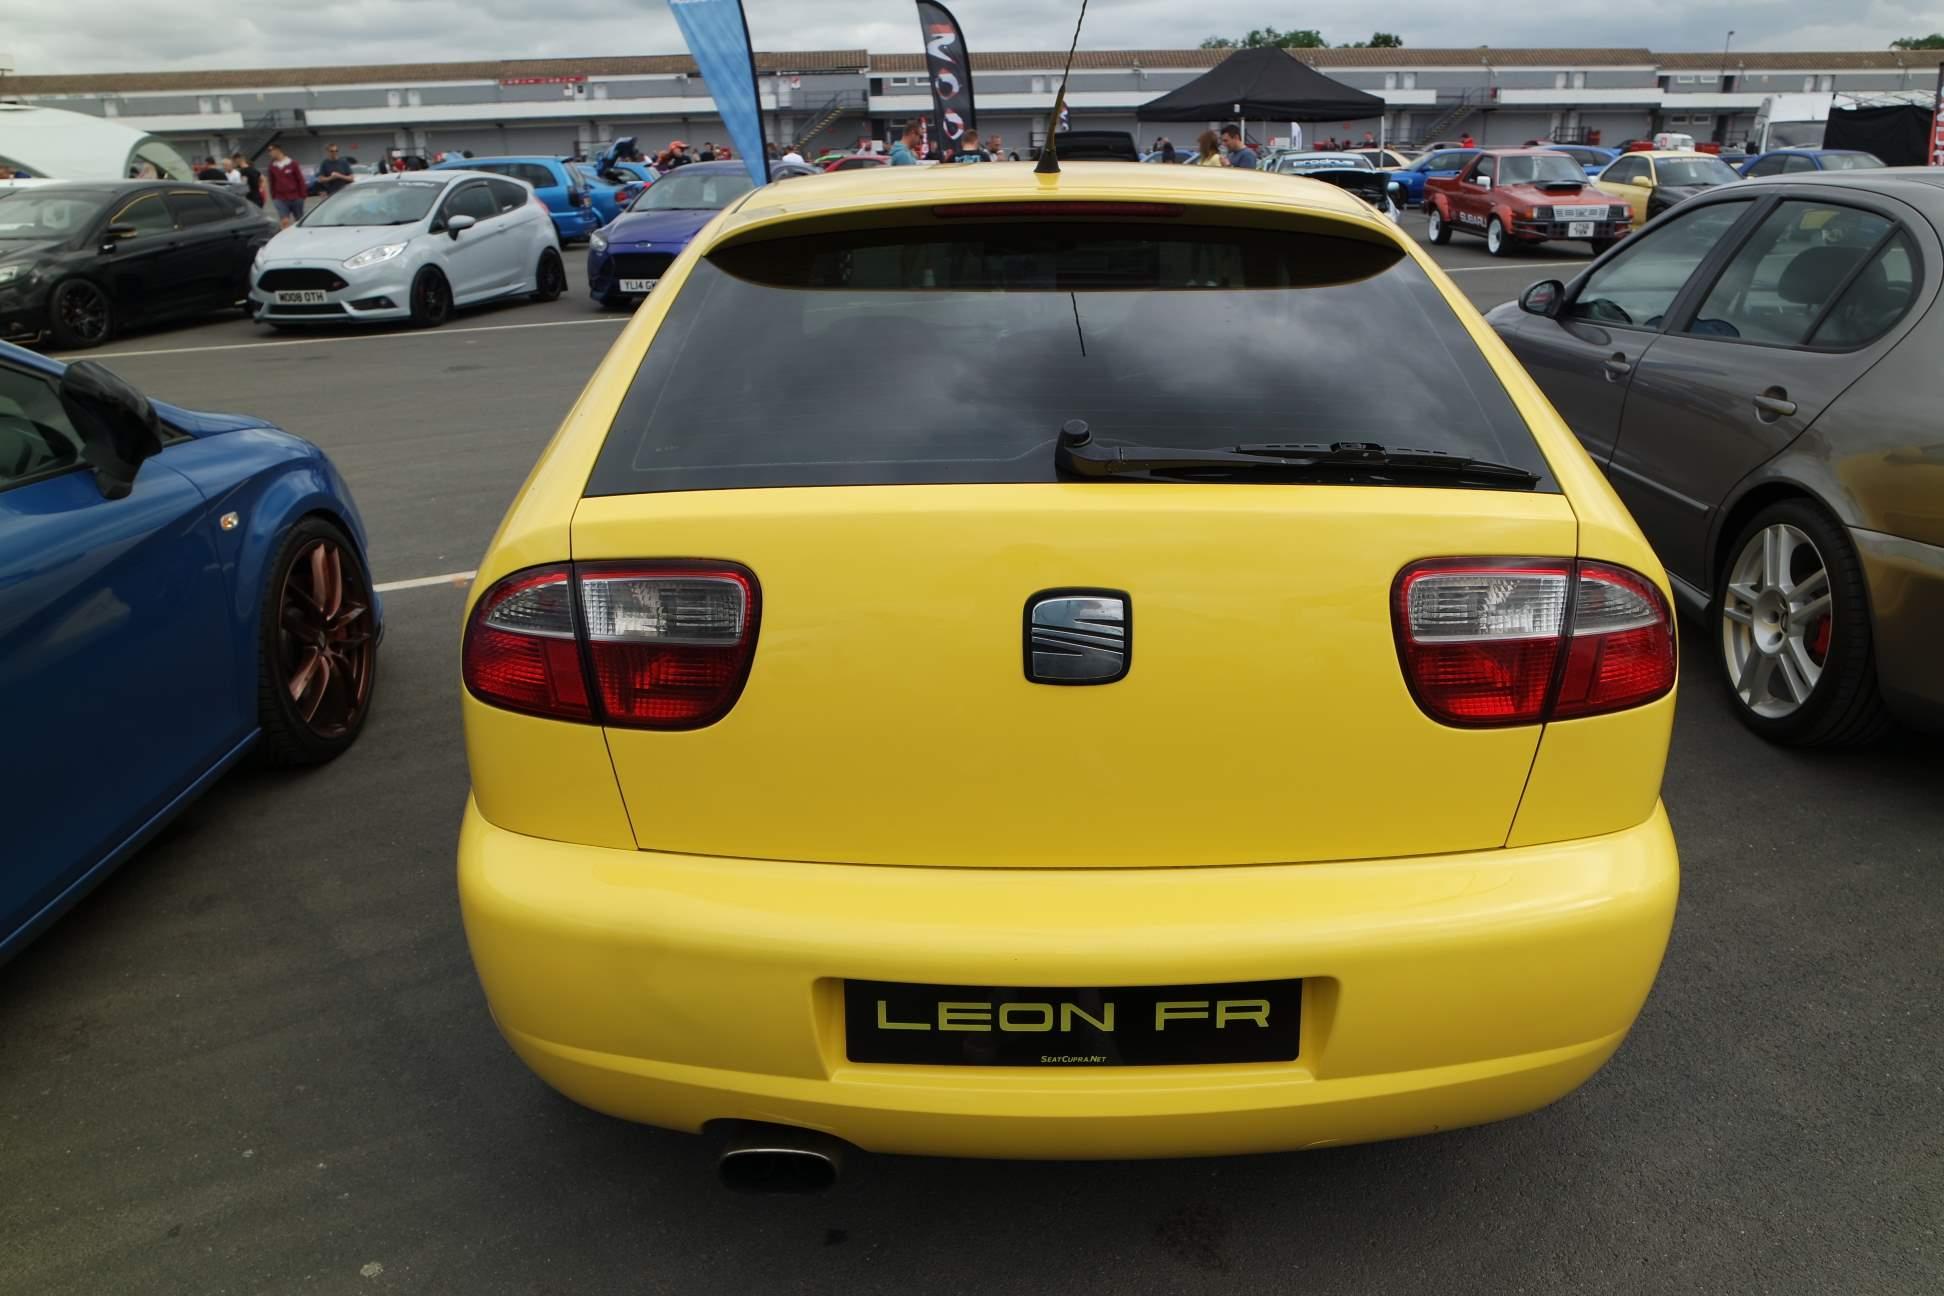 Yellowfr-1.jpg